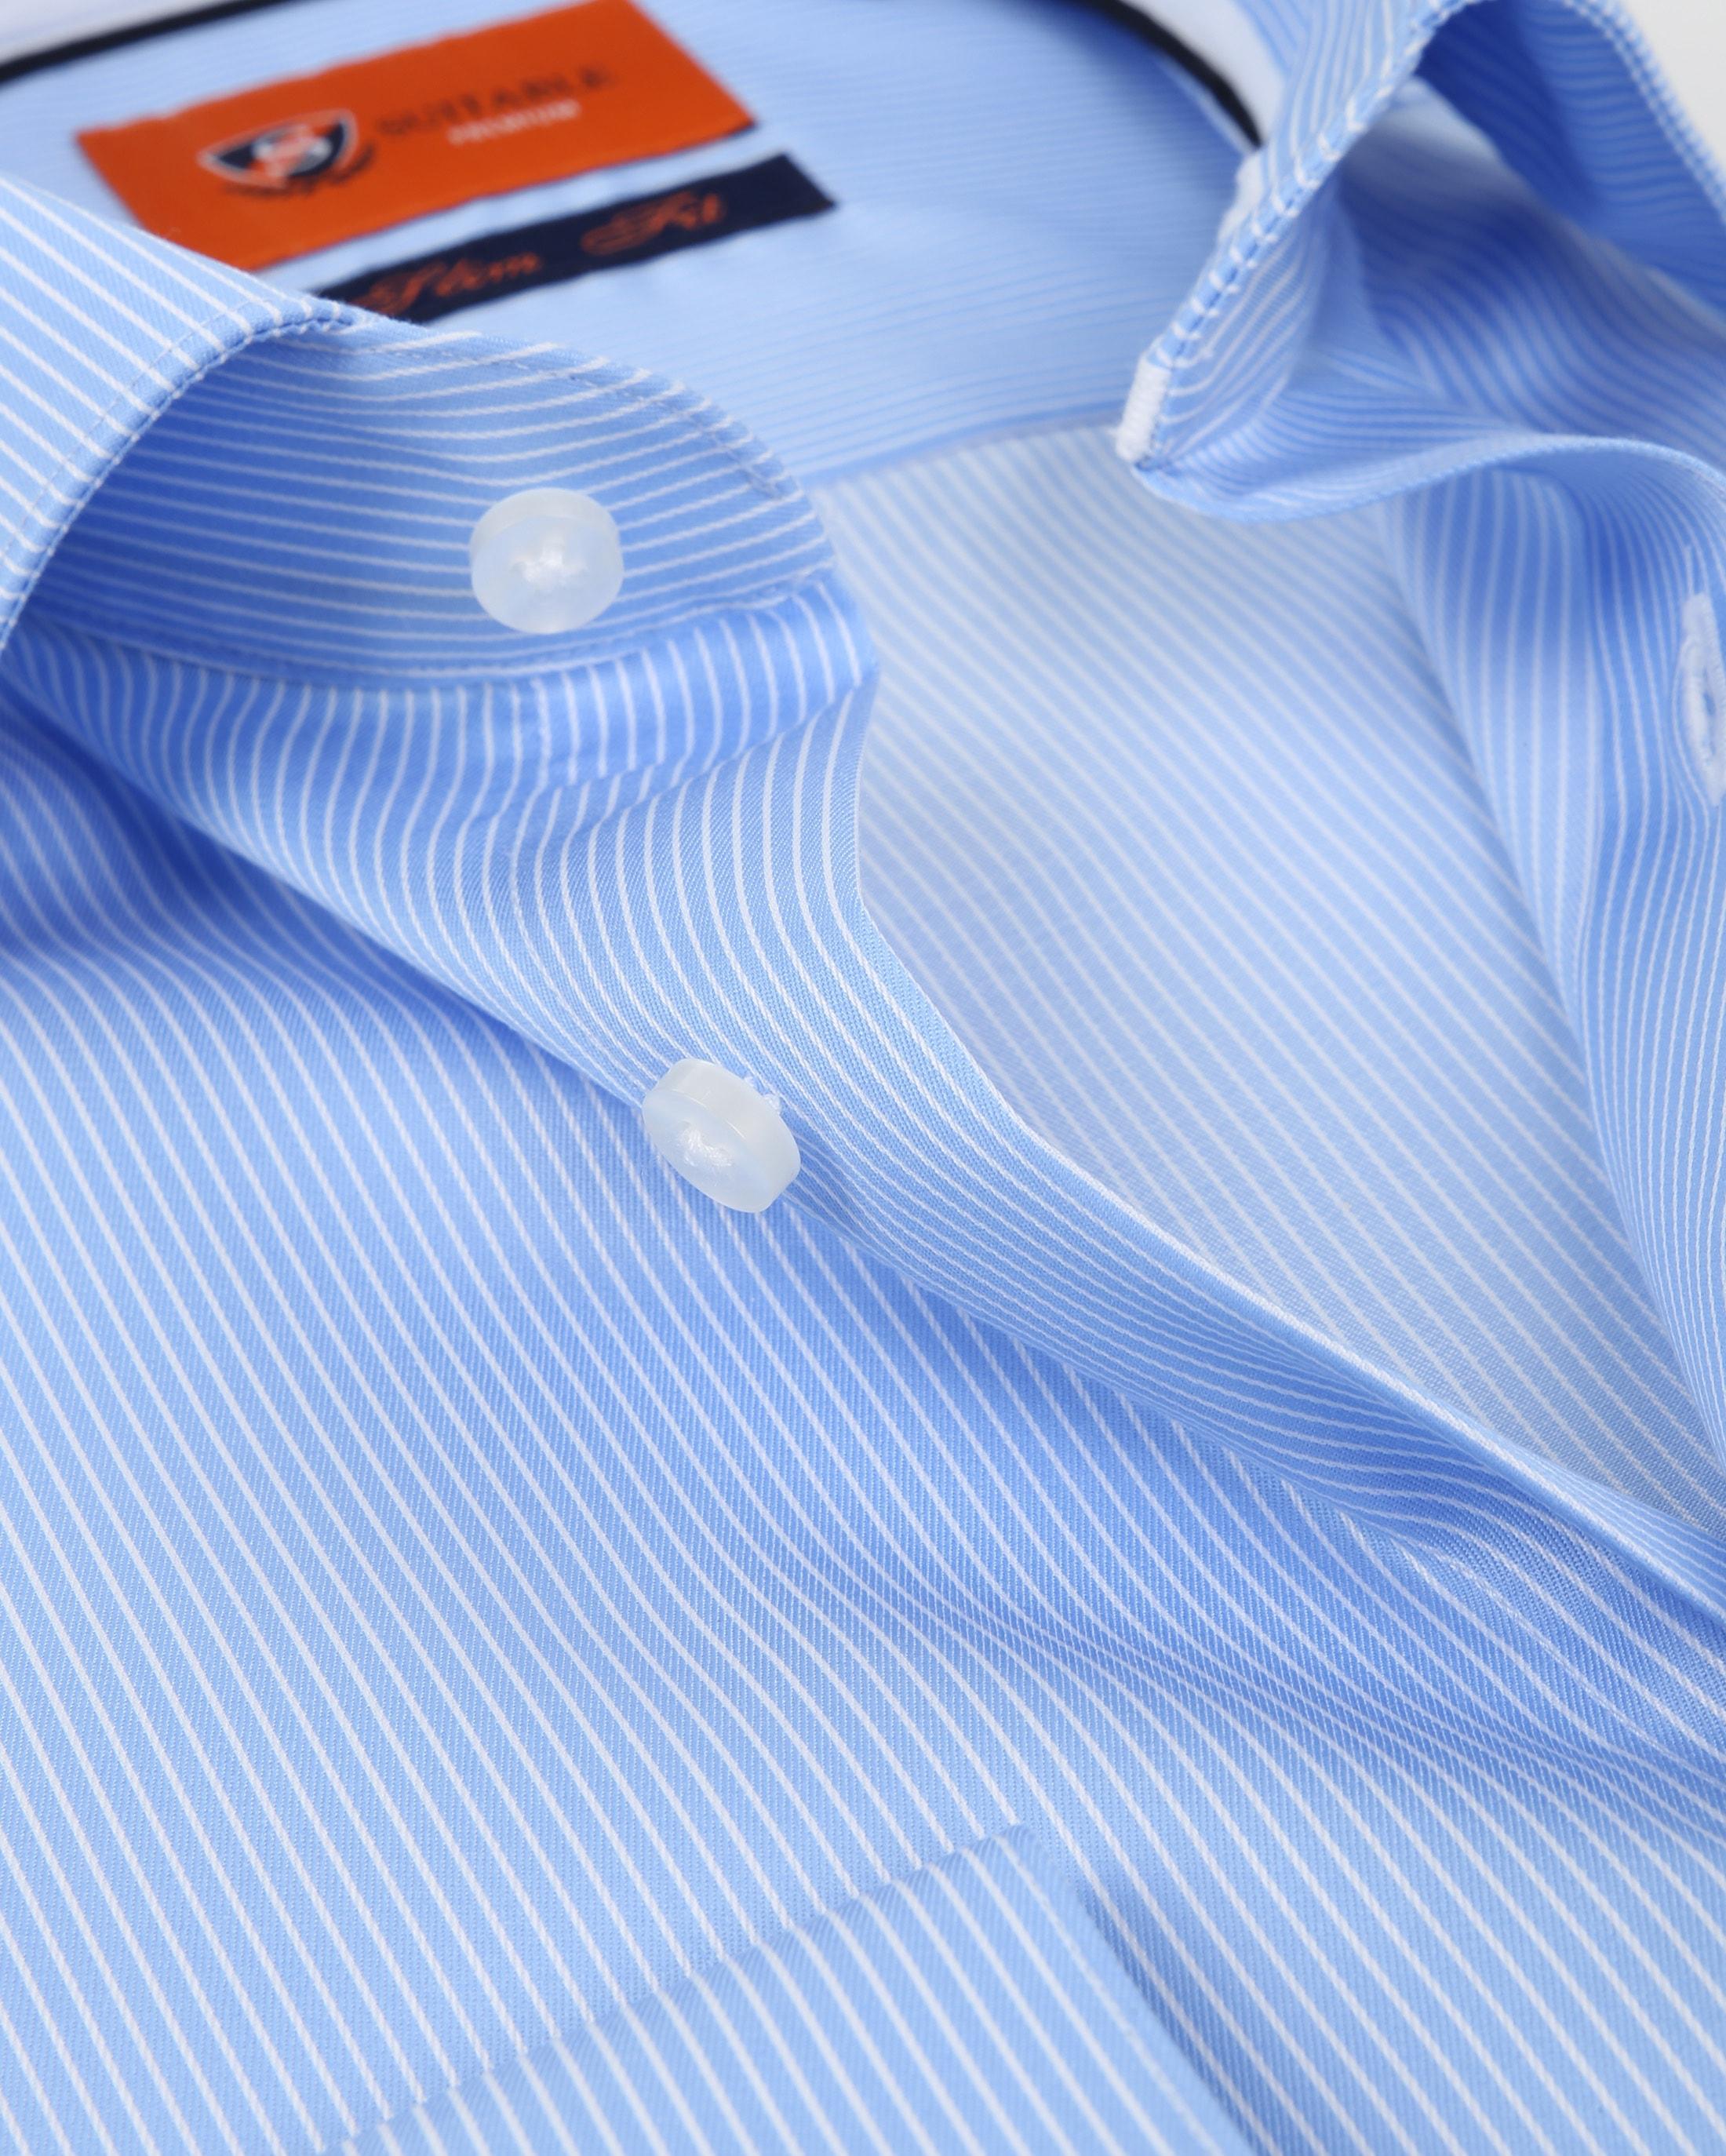 Suitable Hemd Blau Streifen D81-10 foto 1